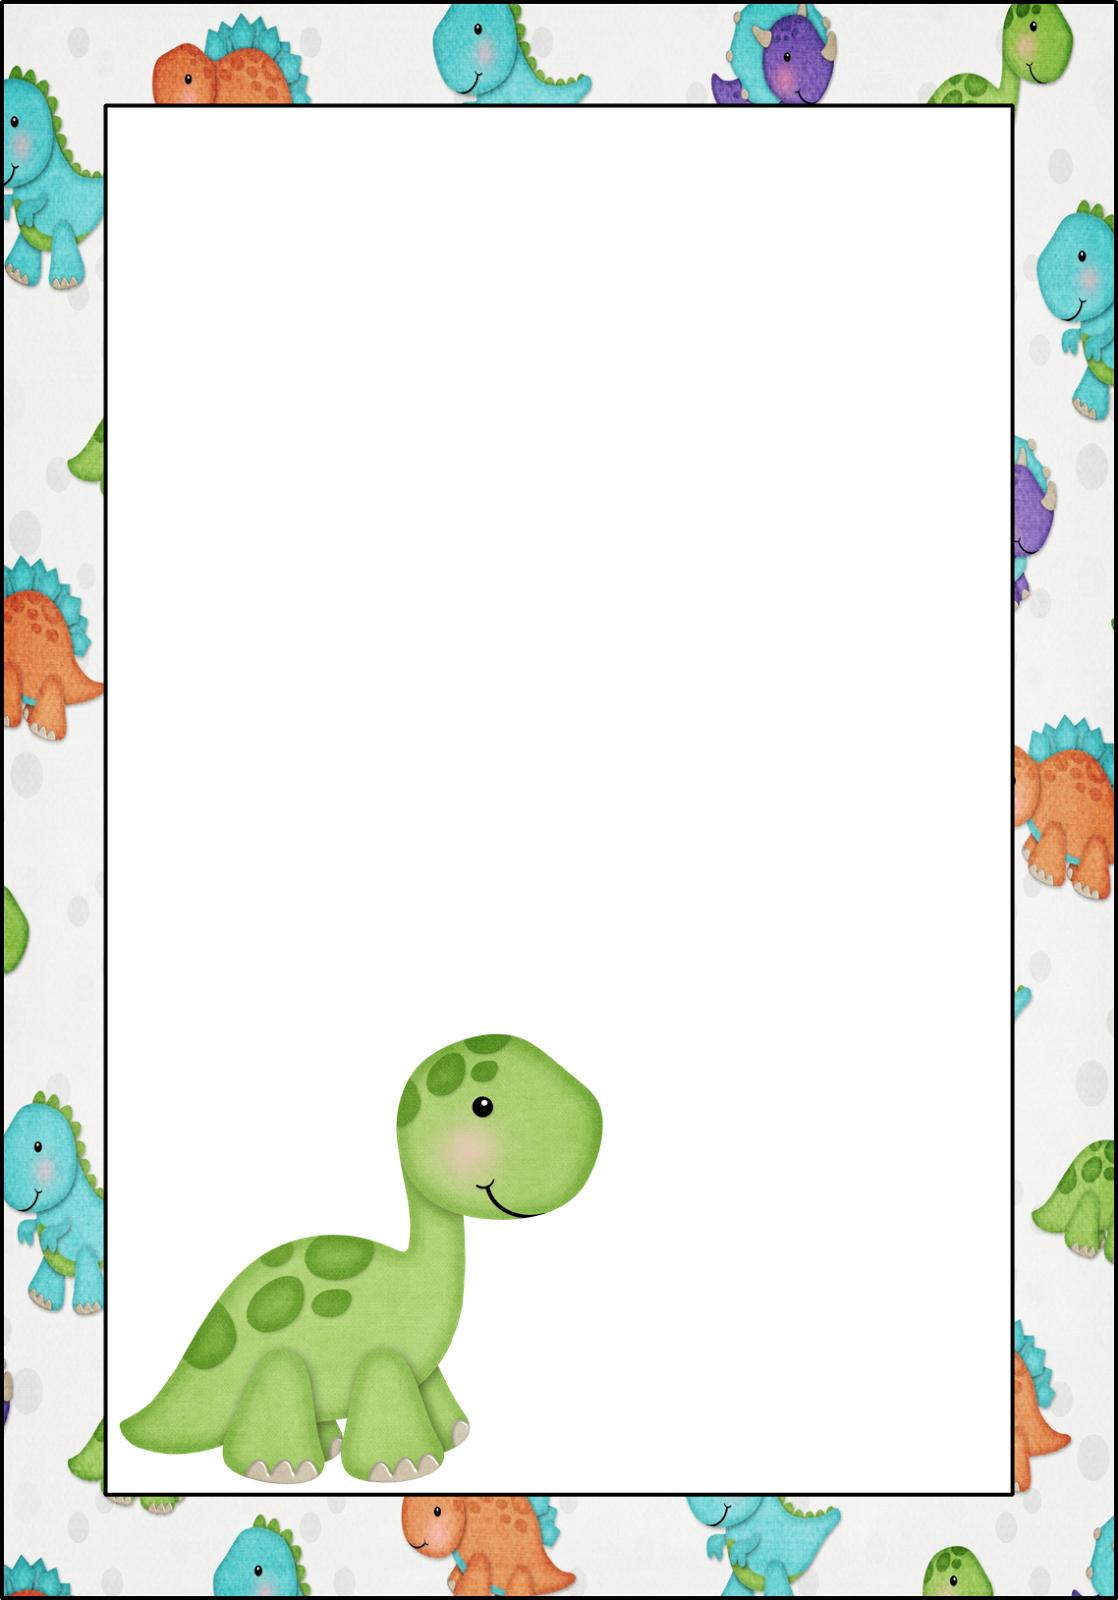 Pinbrenda Montes On Dinousours In 2019 | Dinosaur Invitations - Free Printable Dinosaur Baby Shower Invitations